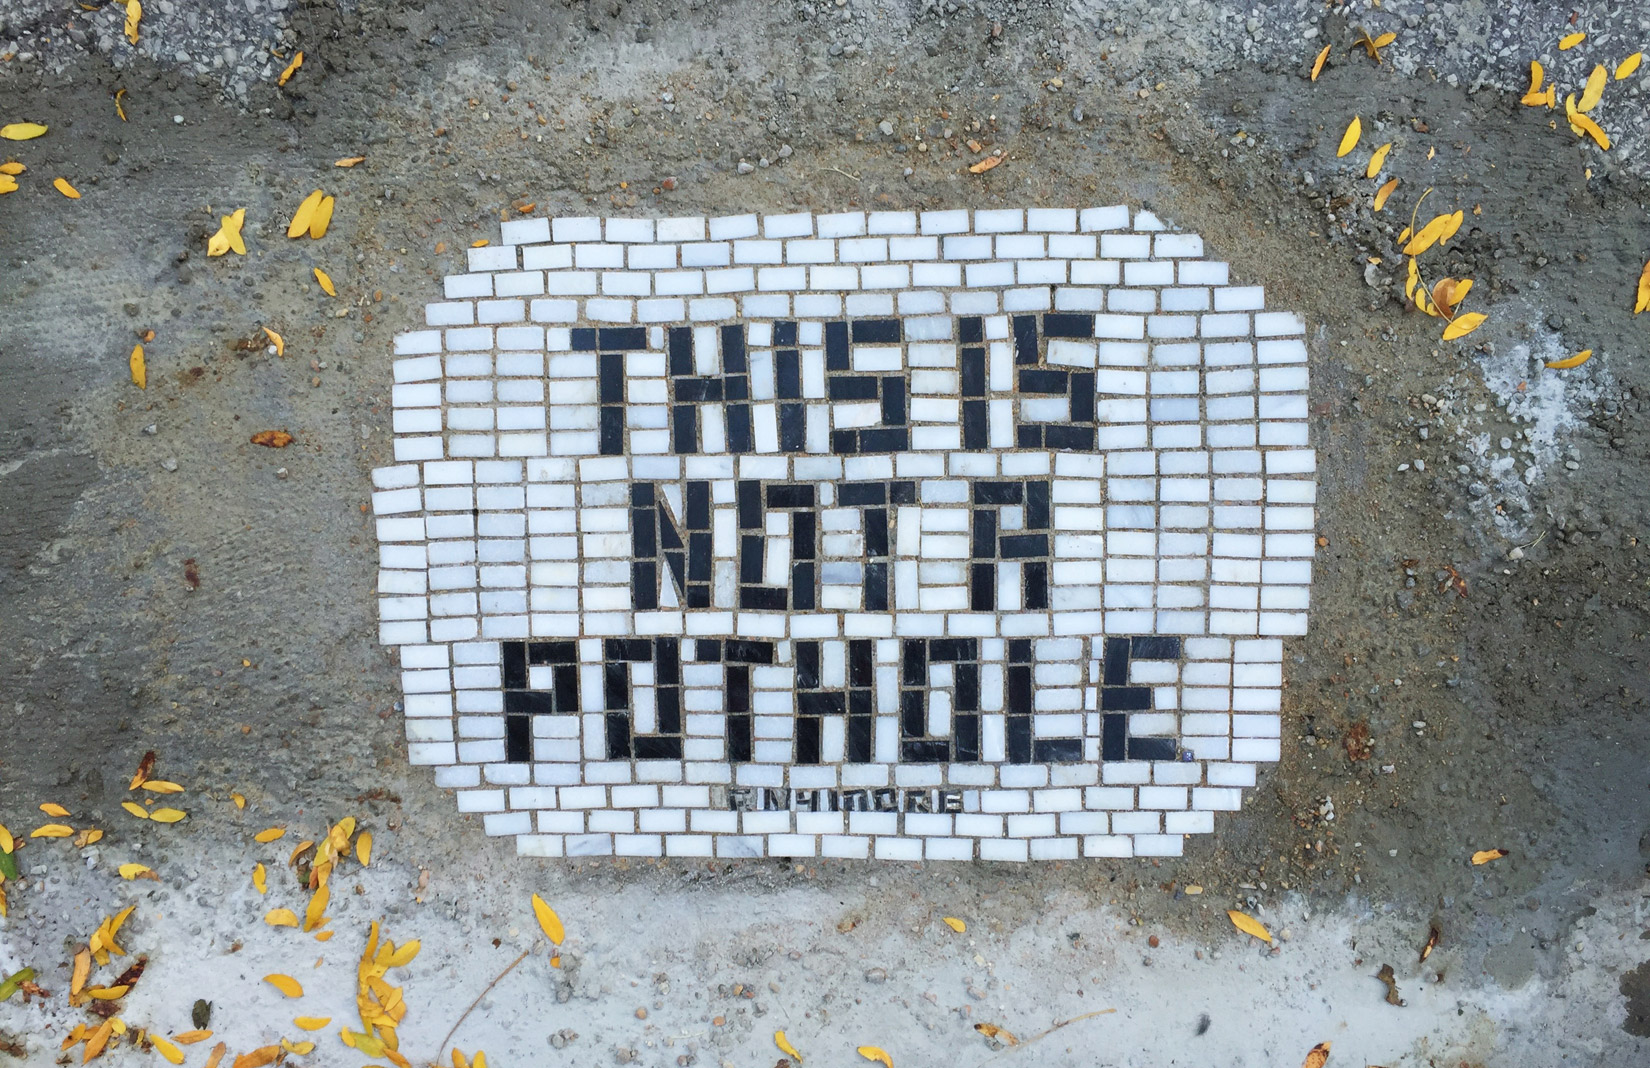 slogan---pothole-mosaic-by-Jim-Bachor